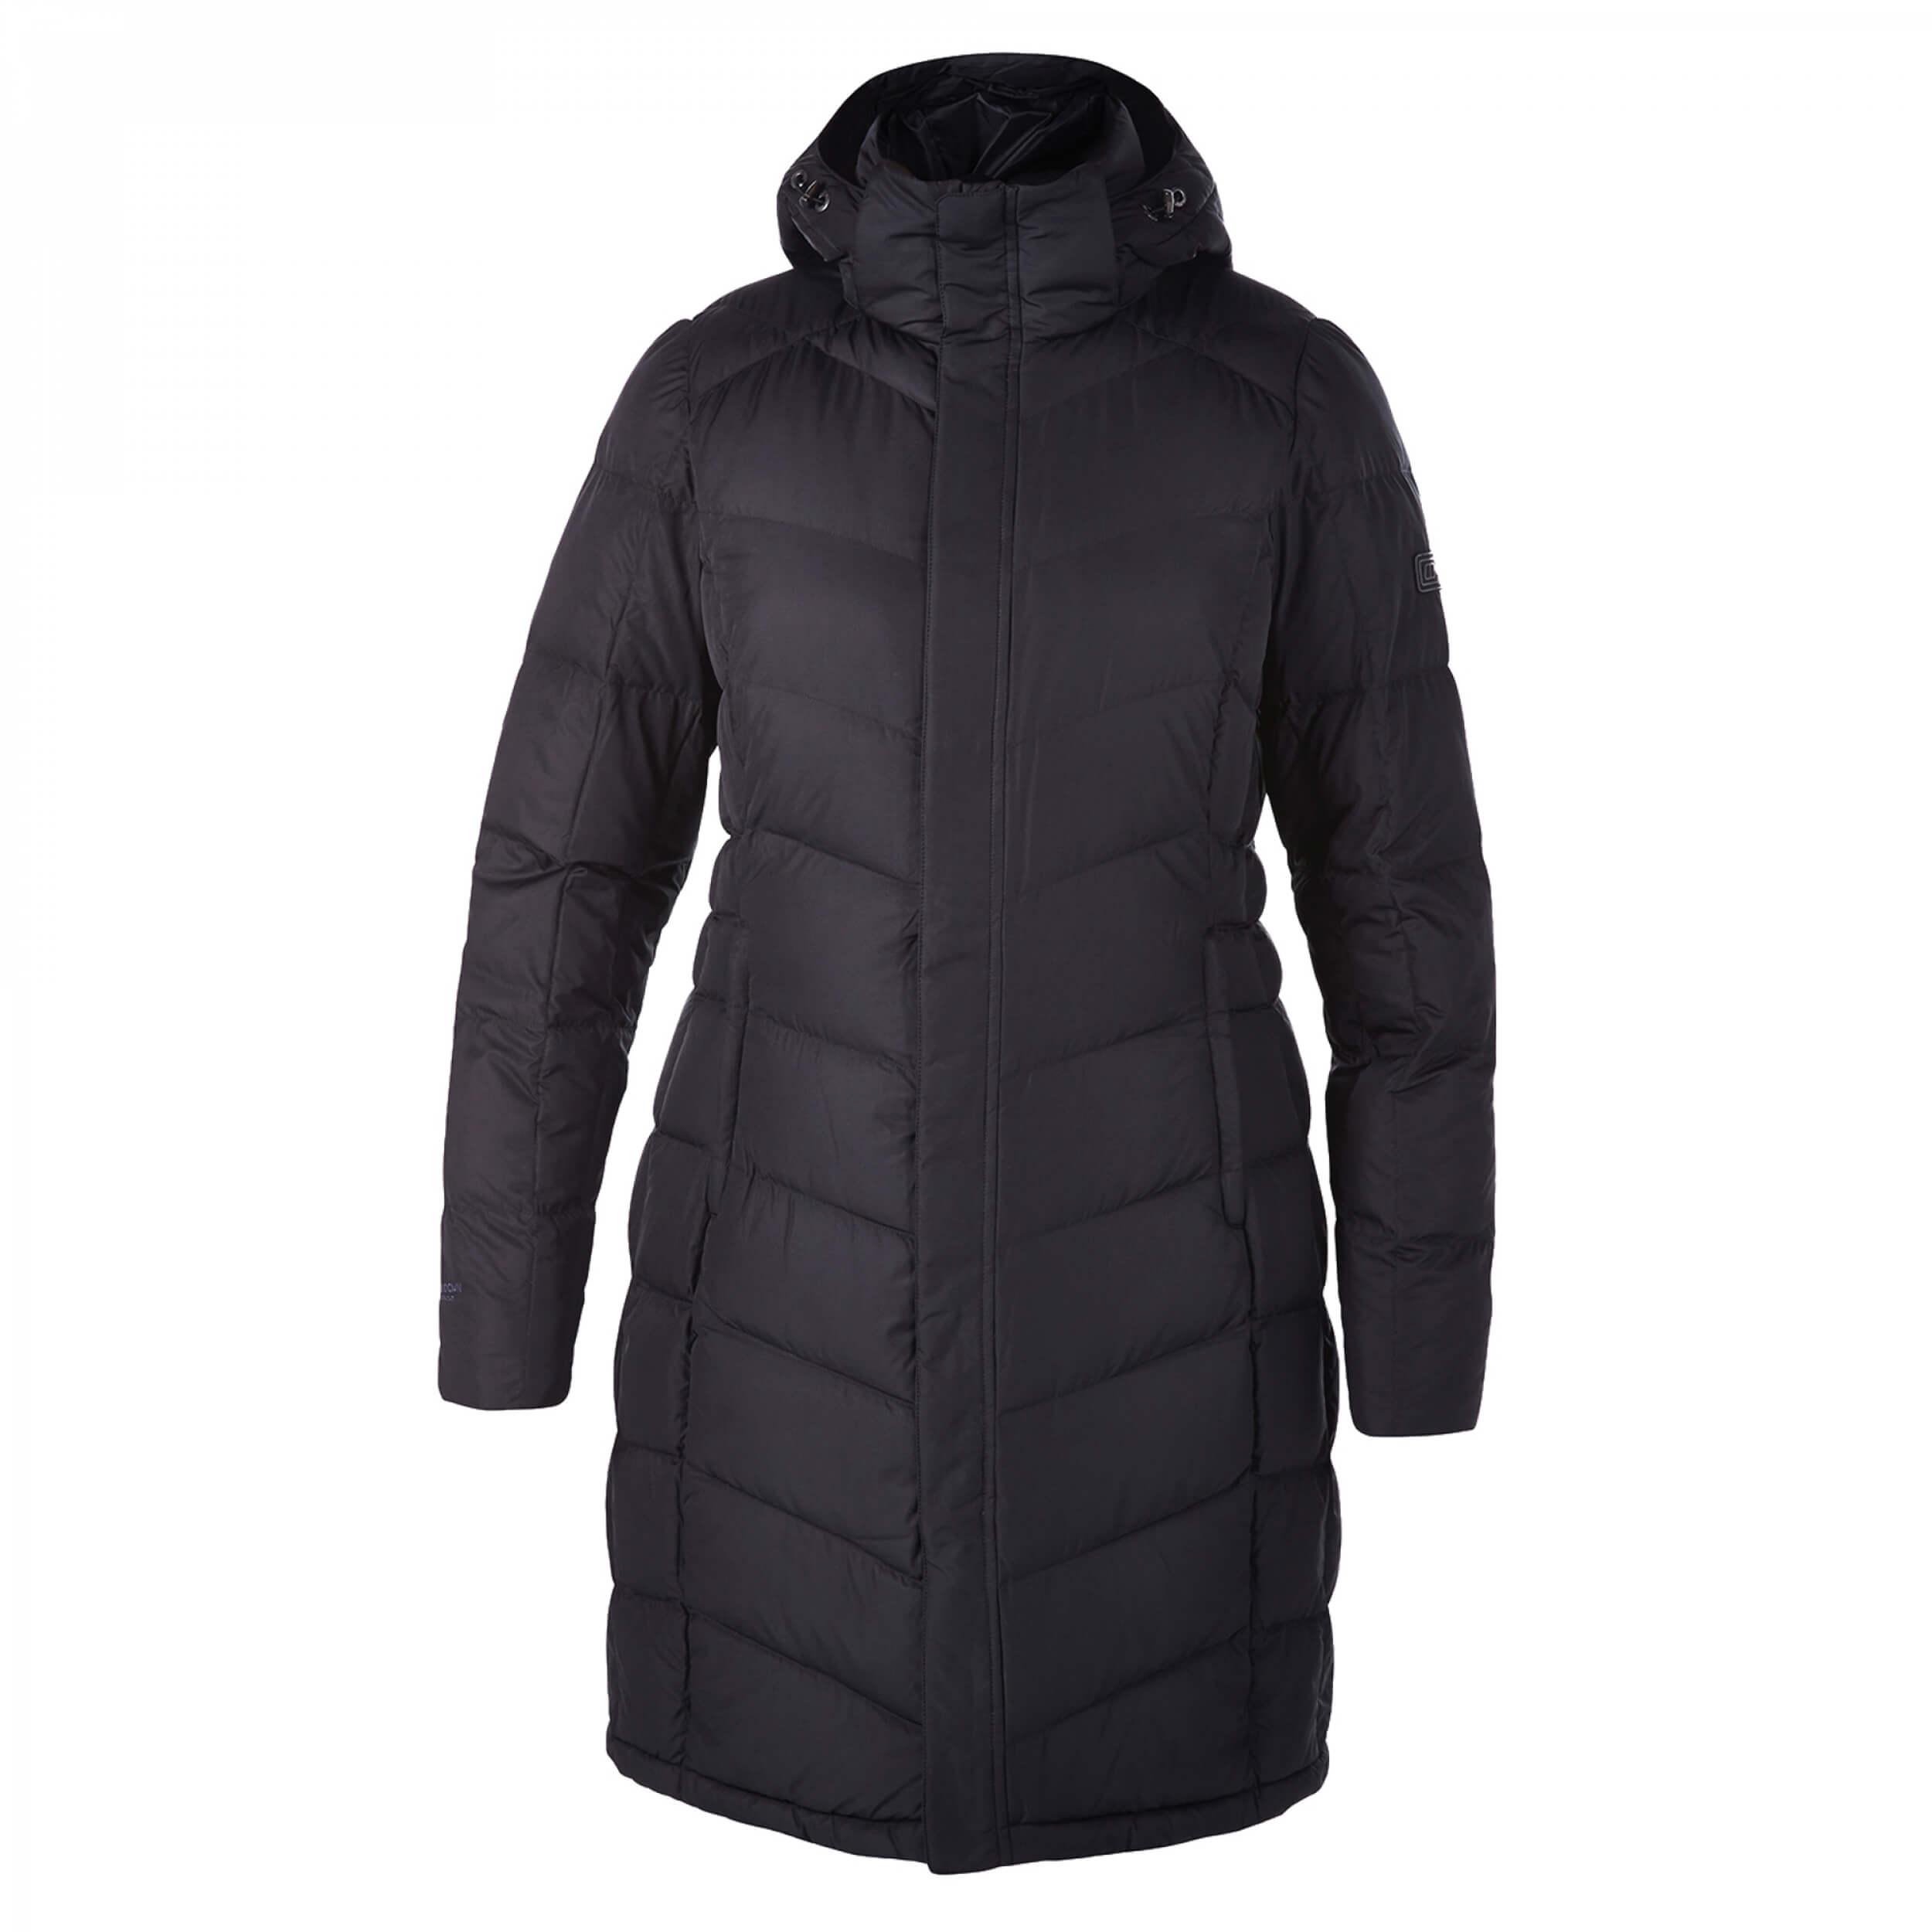 Berghaus Barkley Down Jacket ladies black